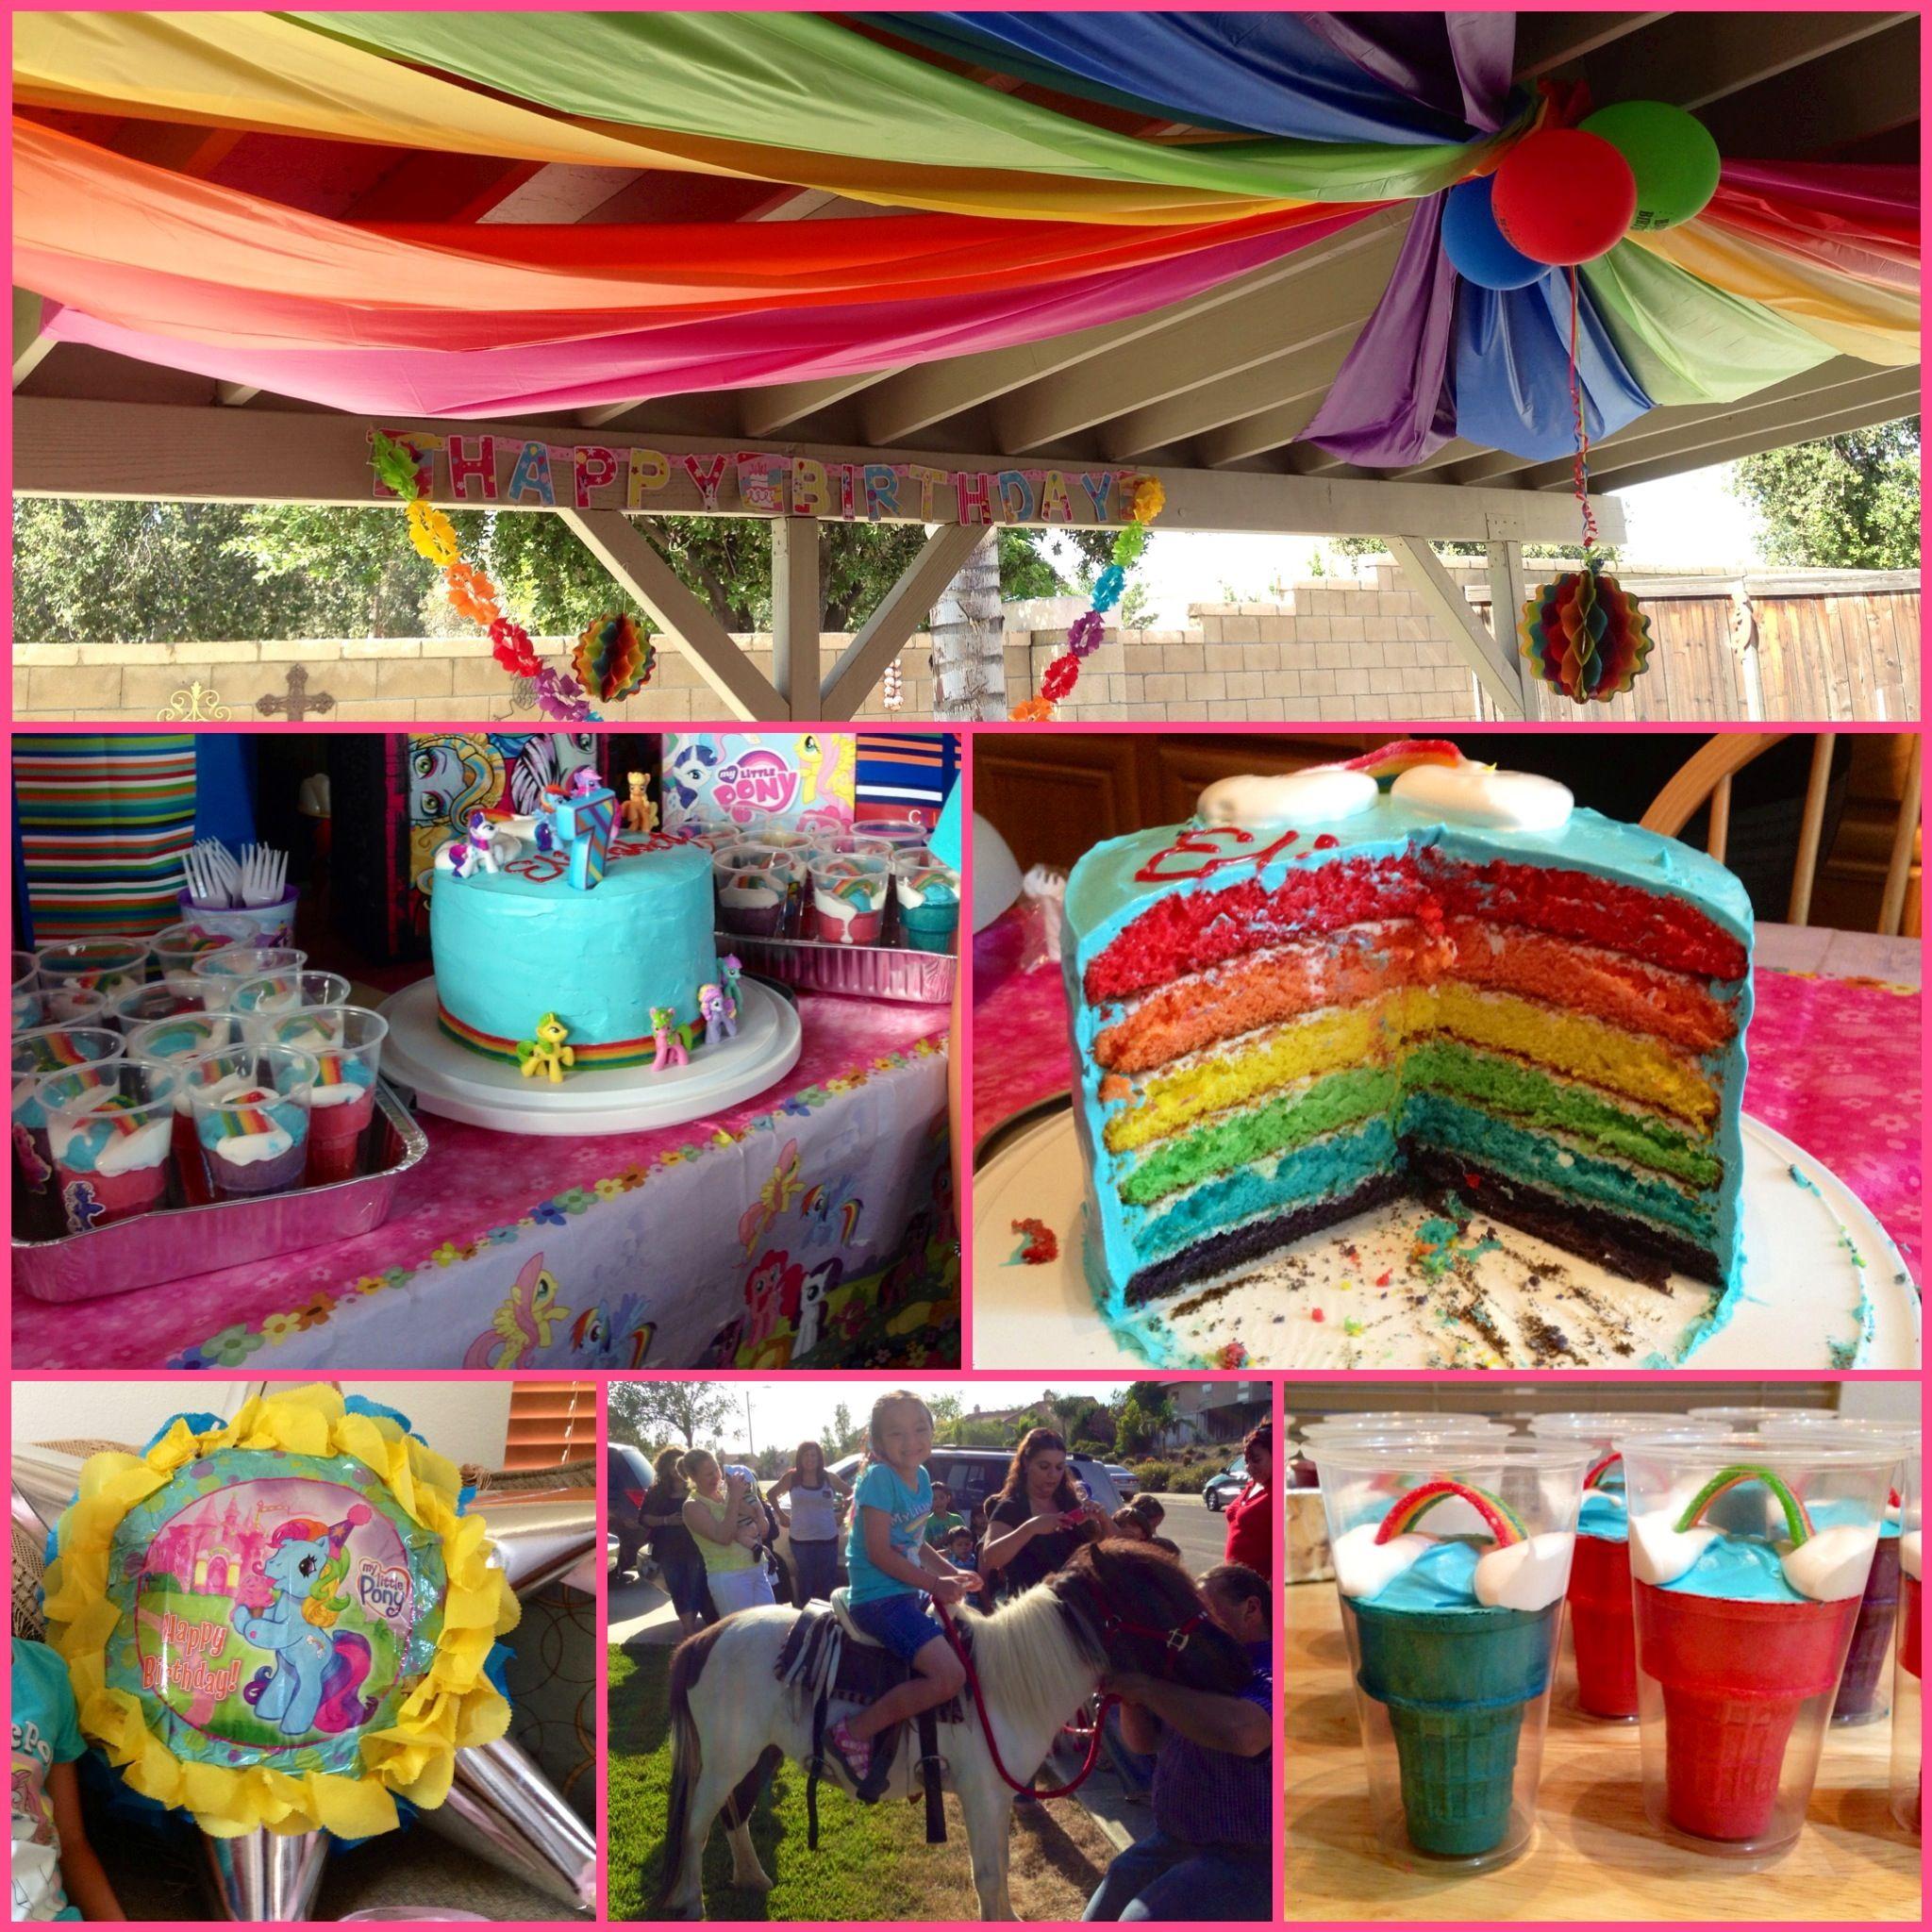 My Little Pony Party Pony jumper Piata Rainbow cake candy